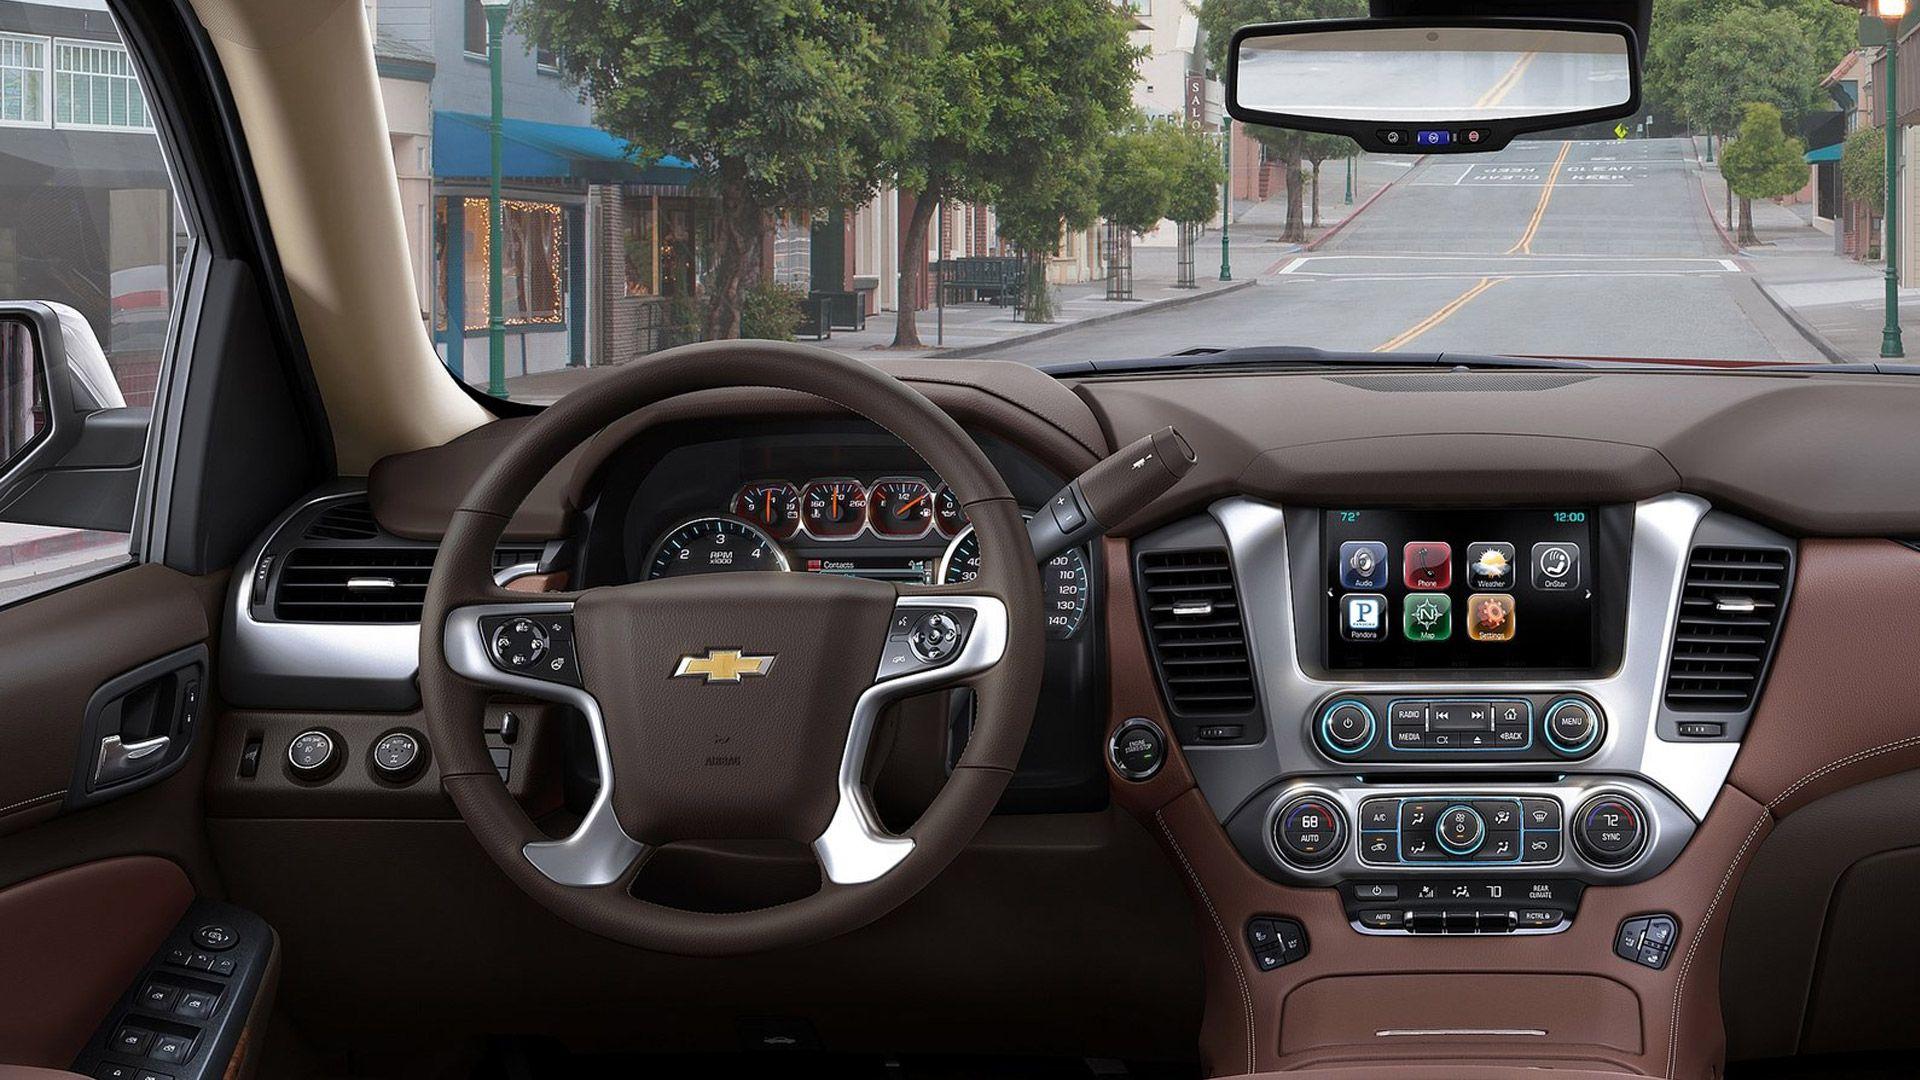 2015 Chevrolet Tahoe Dashboard 2015 Chevrolet Tahoe Features